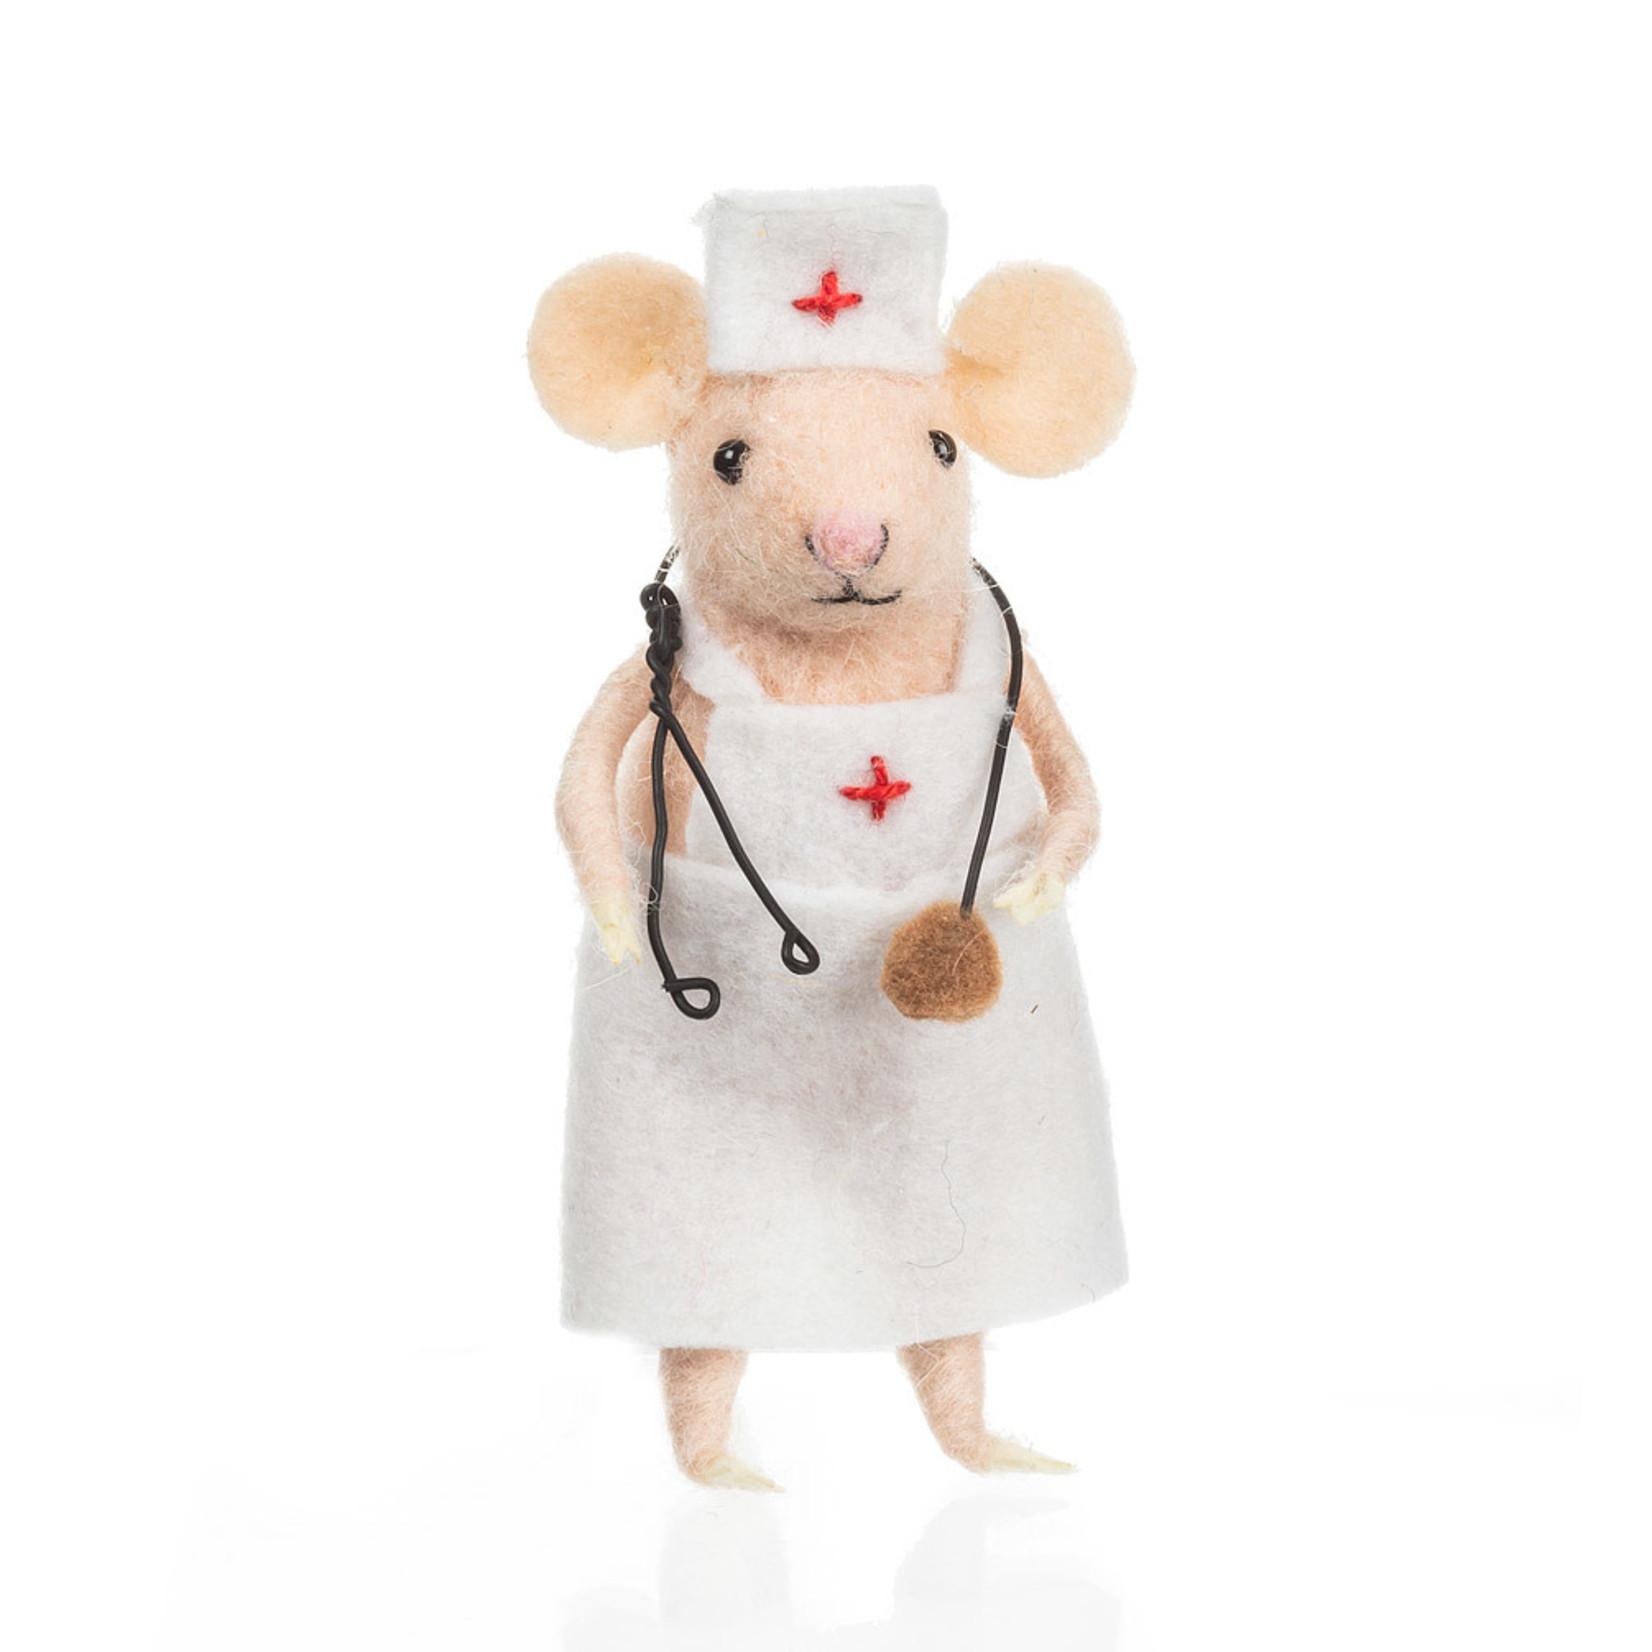 Nurse Mouse in Apron